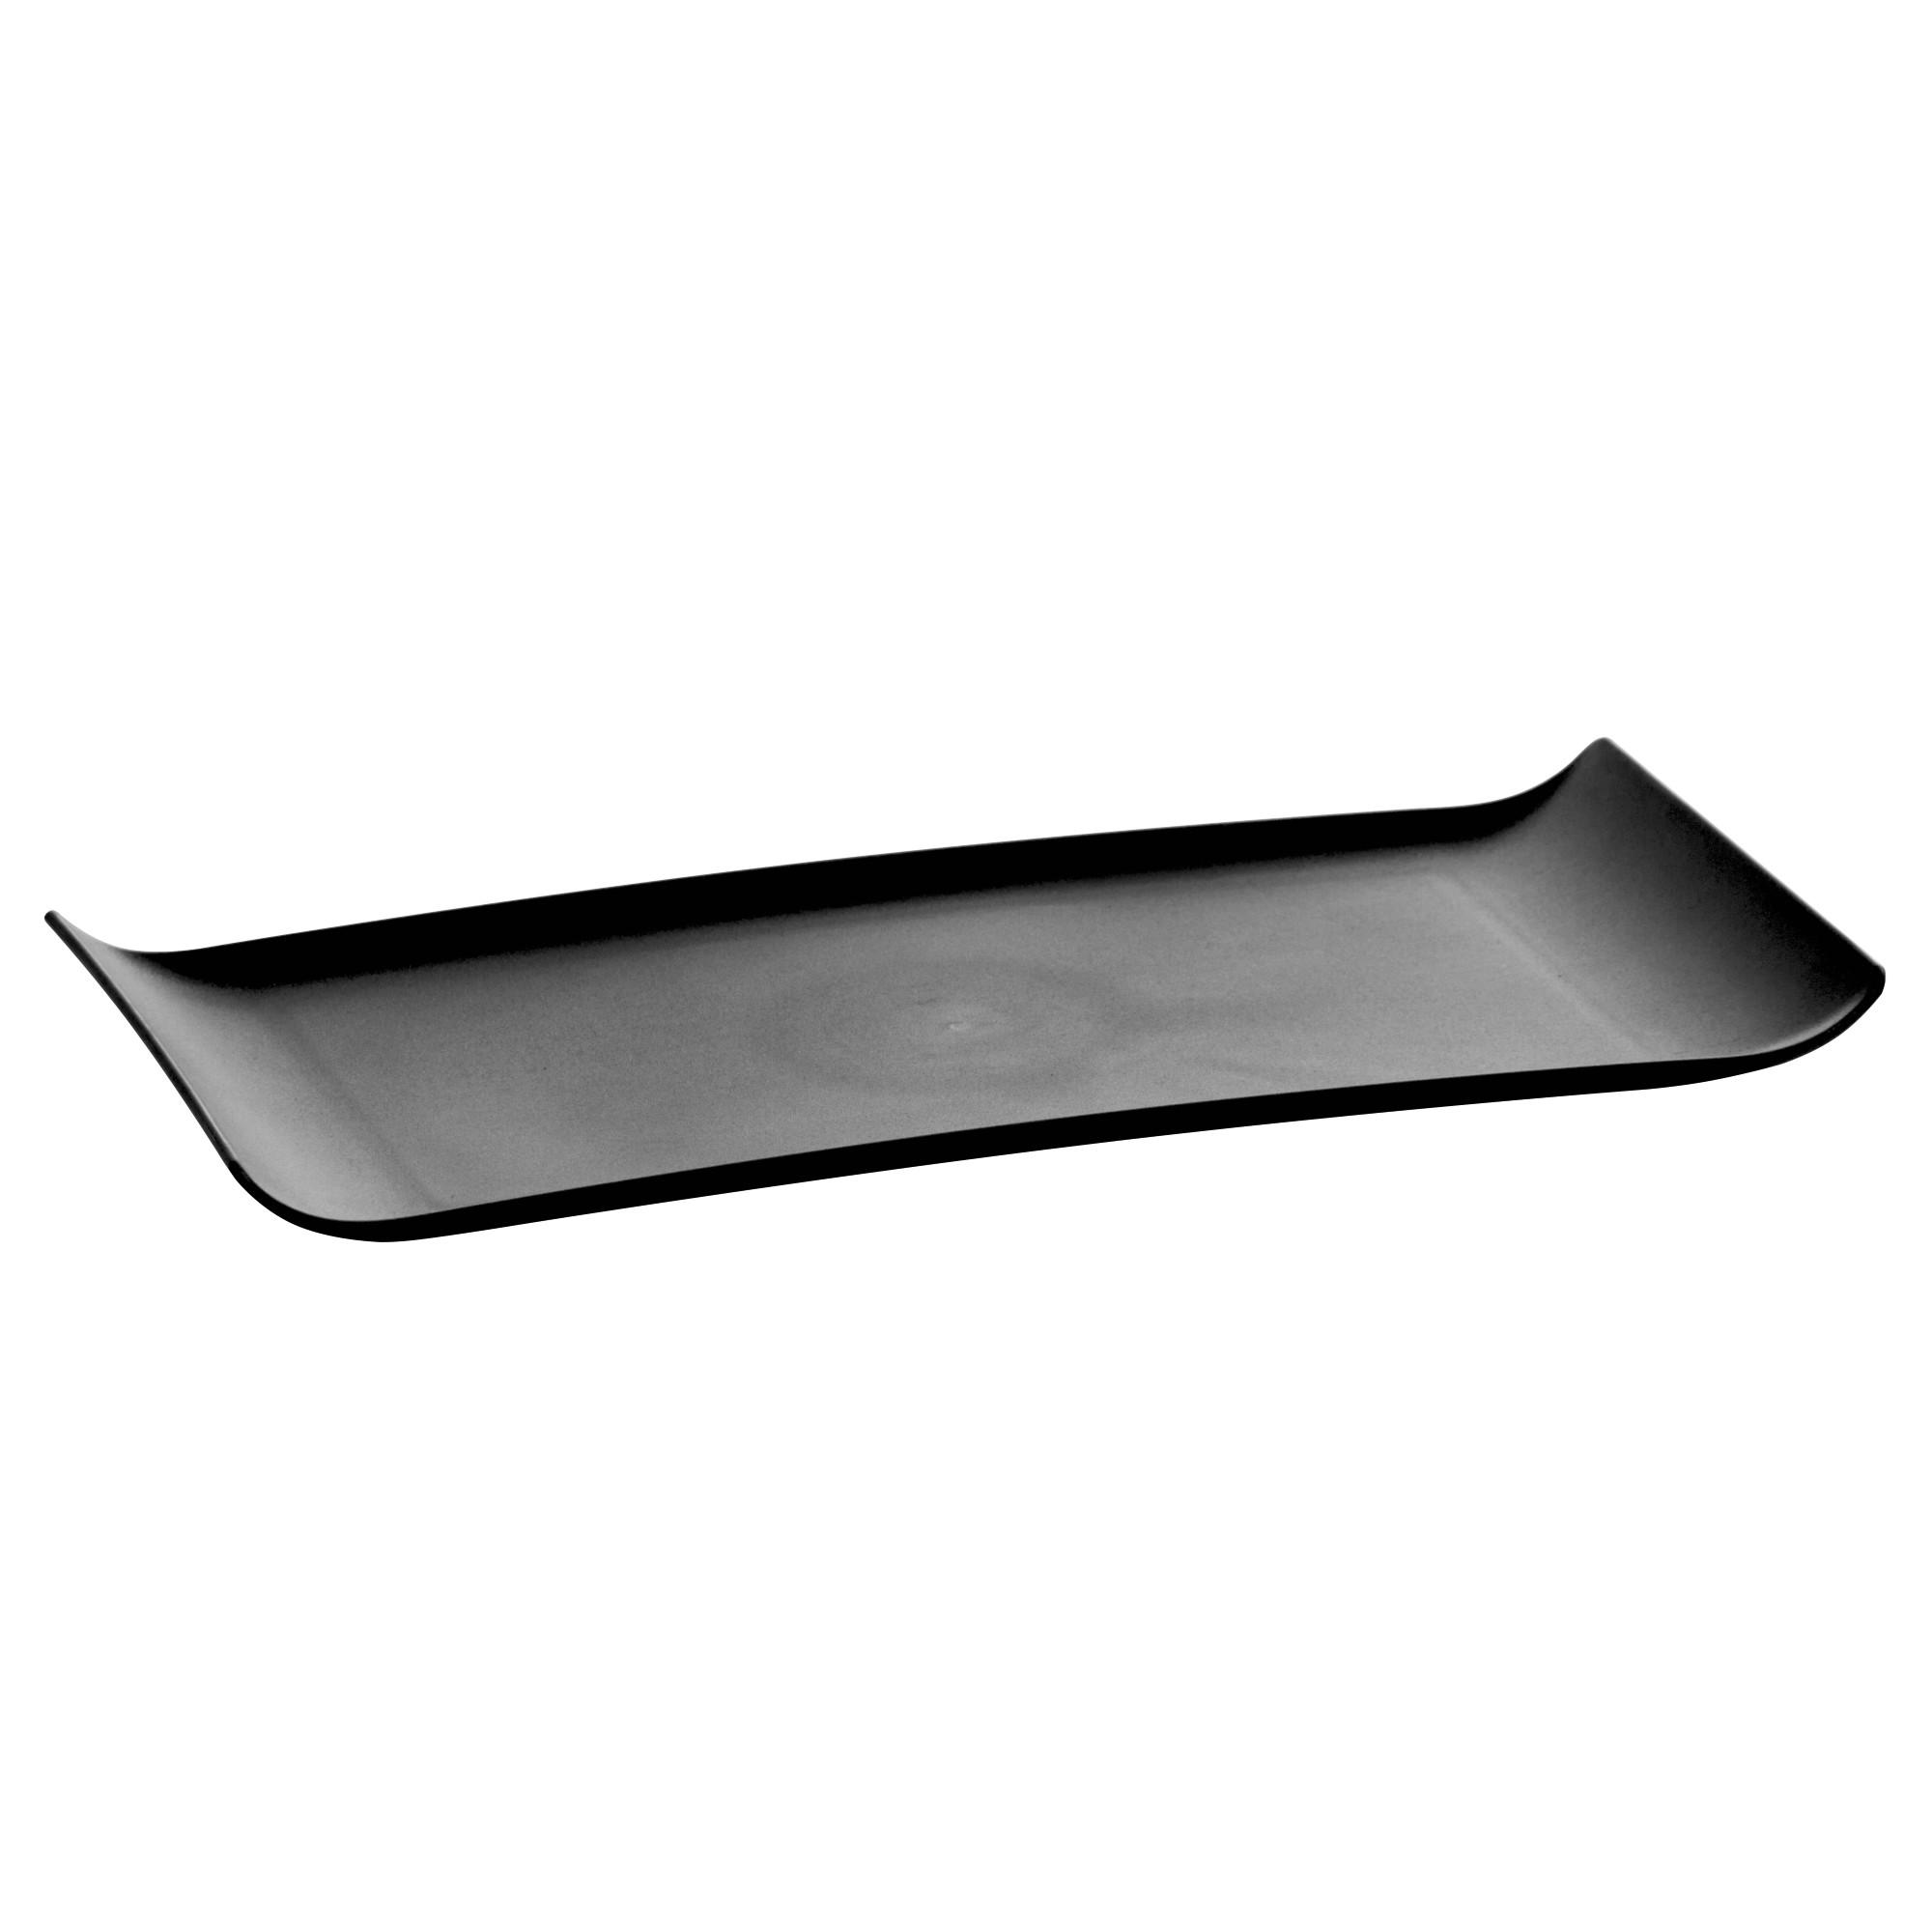 Bandeja Retangular de Plastico 15x30cm - 220 - Vem Plast